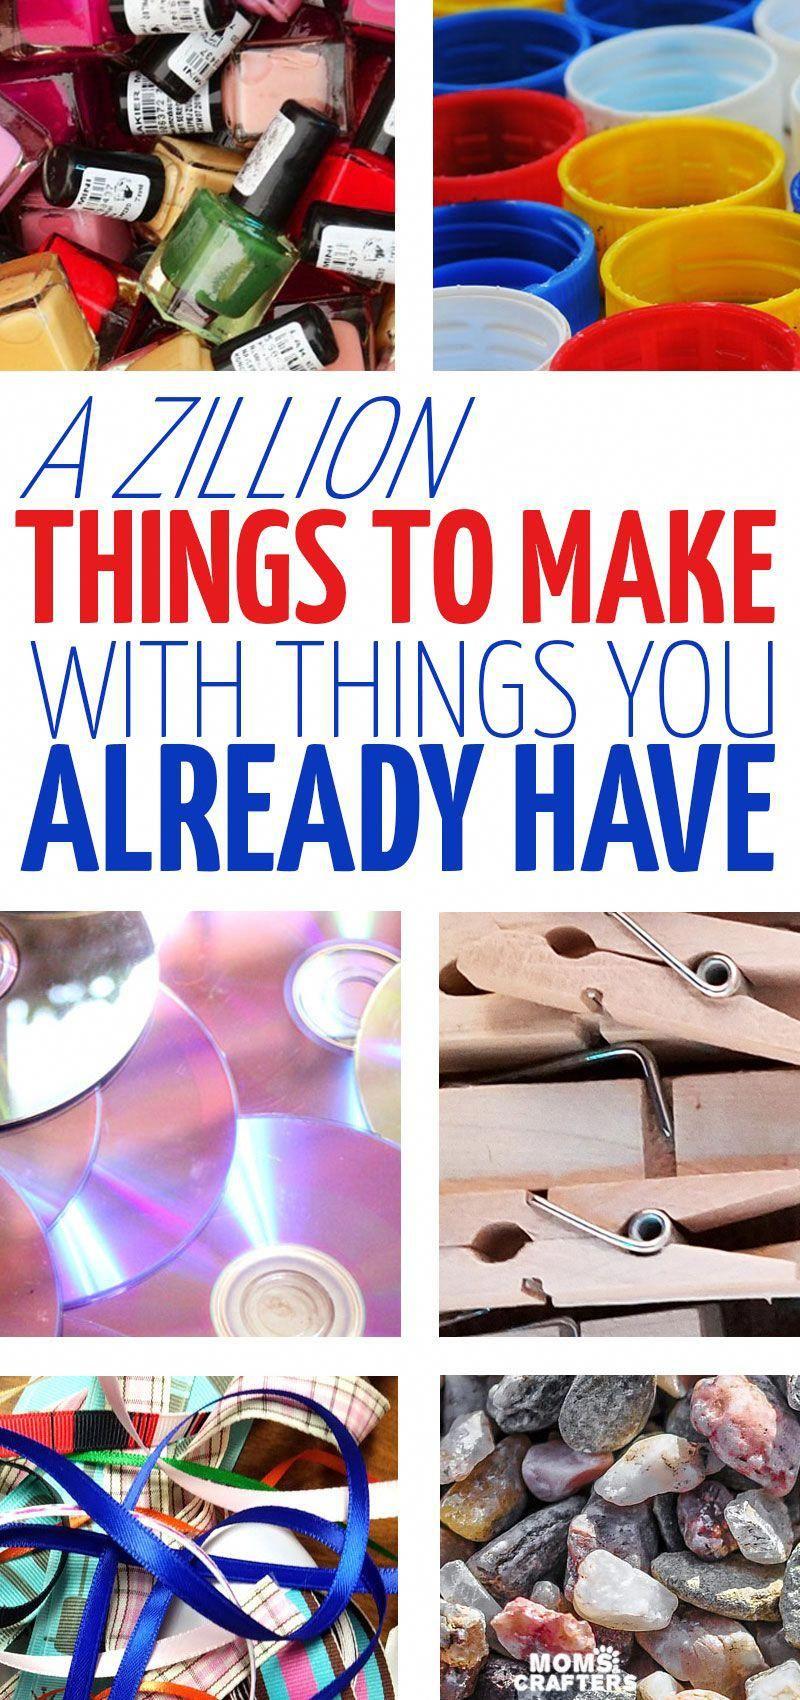 Toysrus Manualidades.Toys R Us Arts And Crafts Preschool Summer Crafts Pinterest